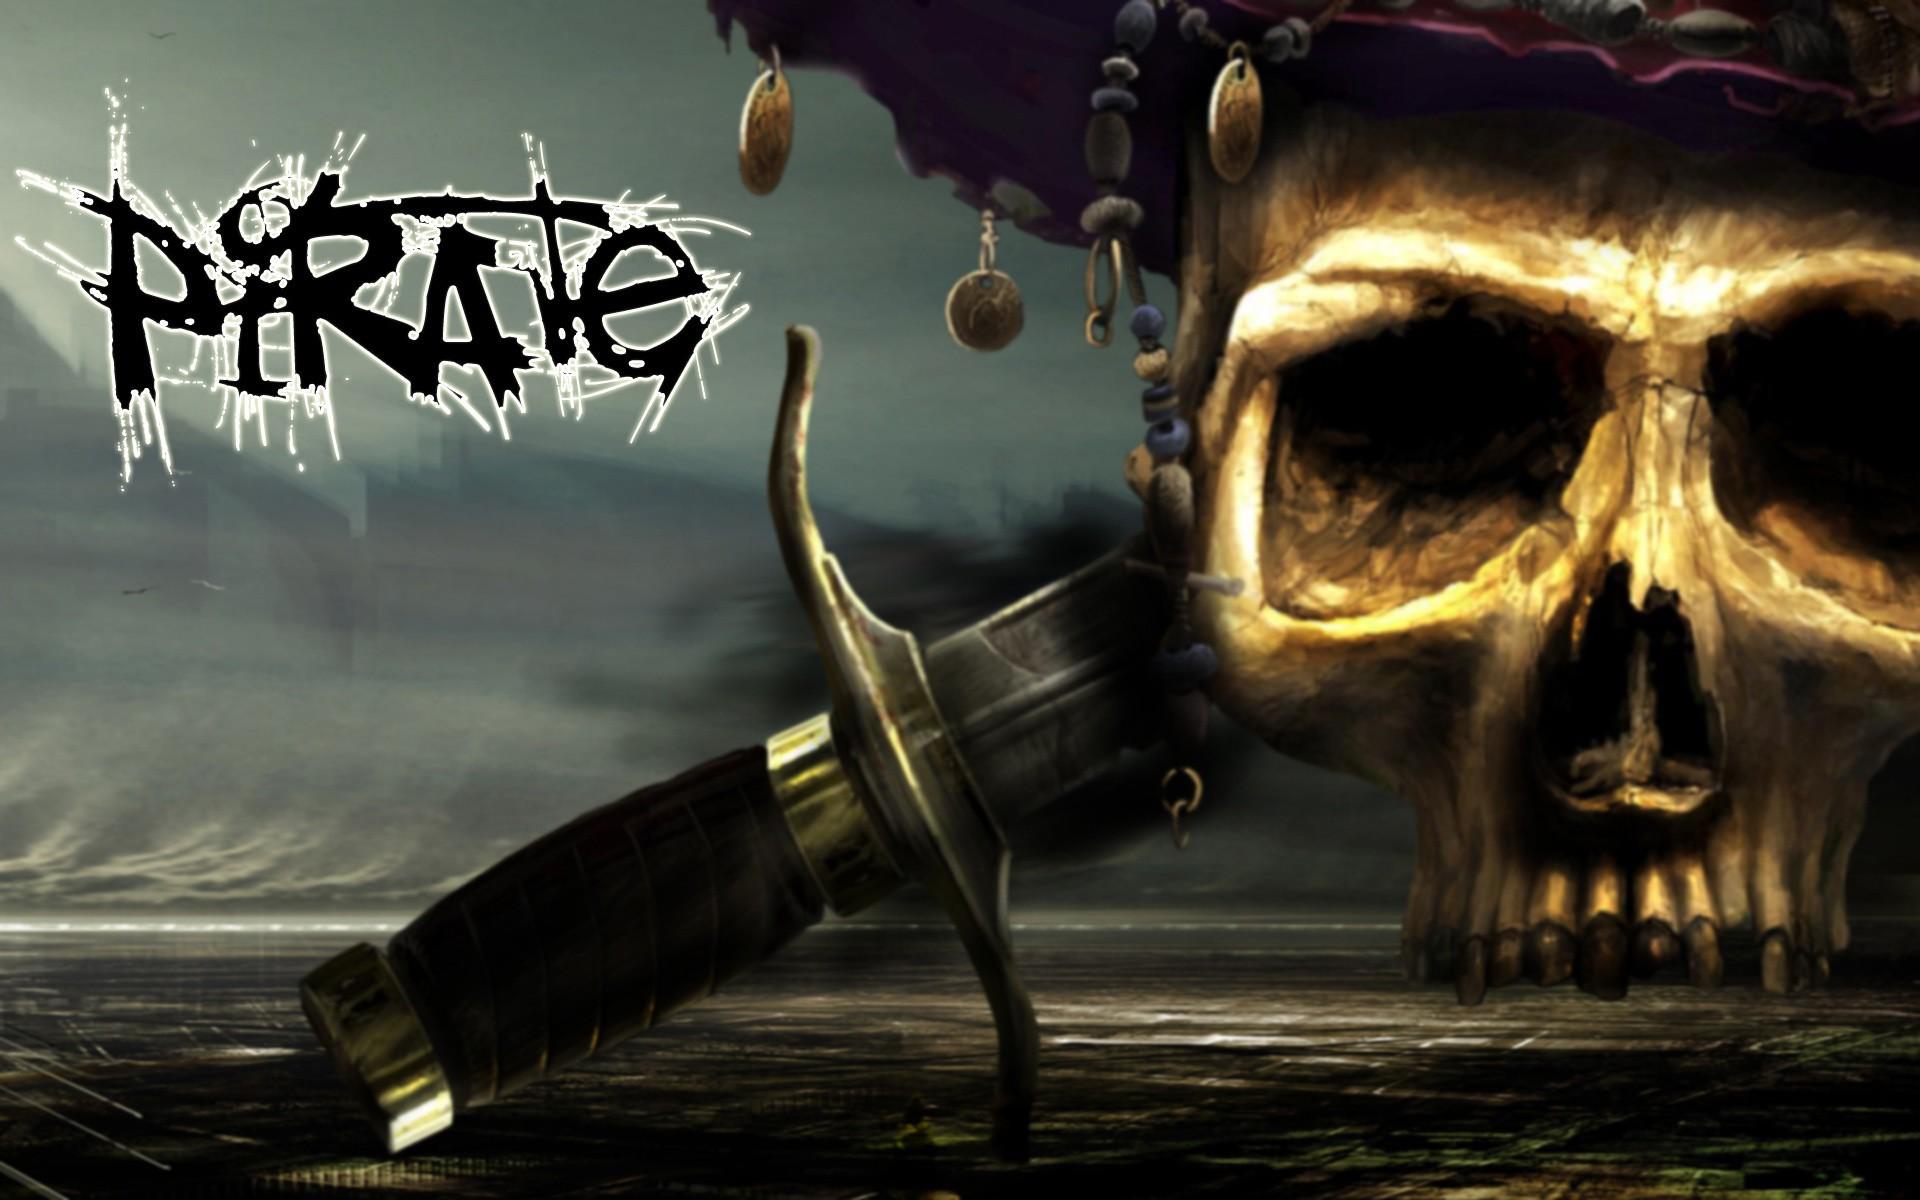 wallpaper skull bones pirate - photo #5